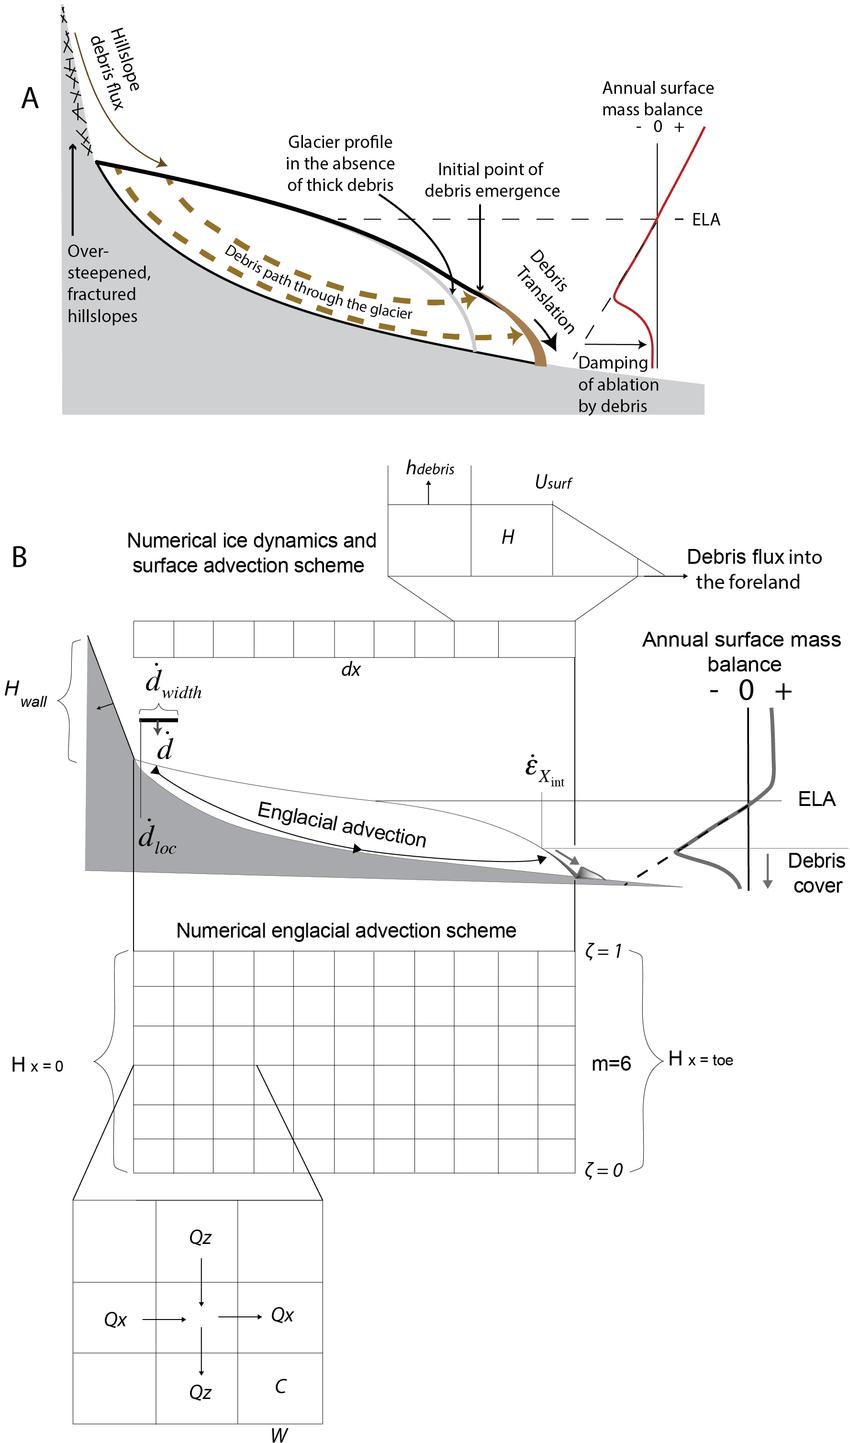 medium resolution of  a schematic of the debris glacier system debris deposited on or emerging